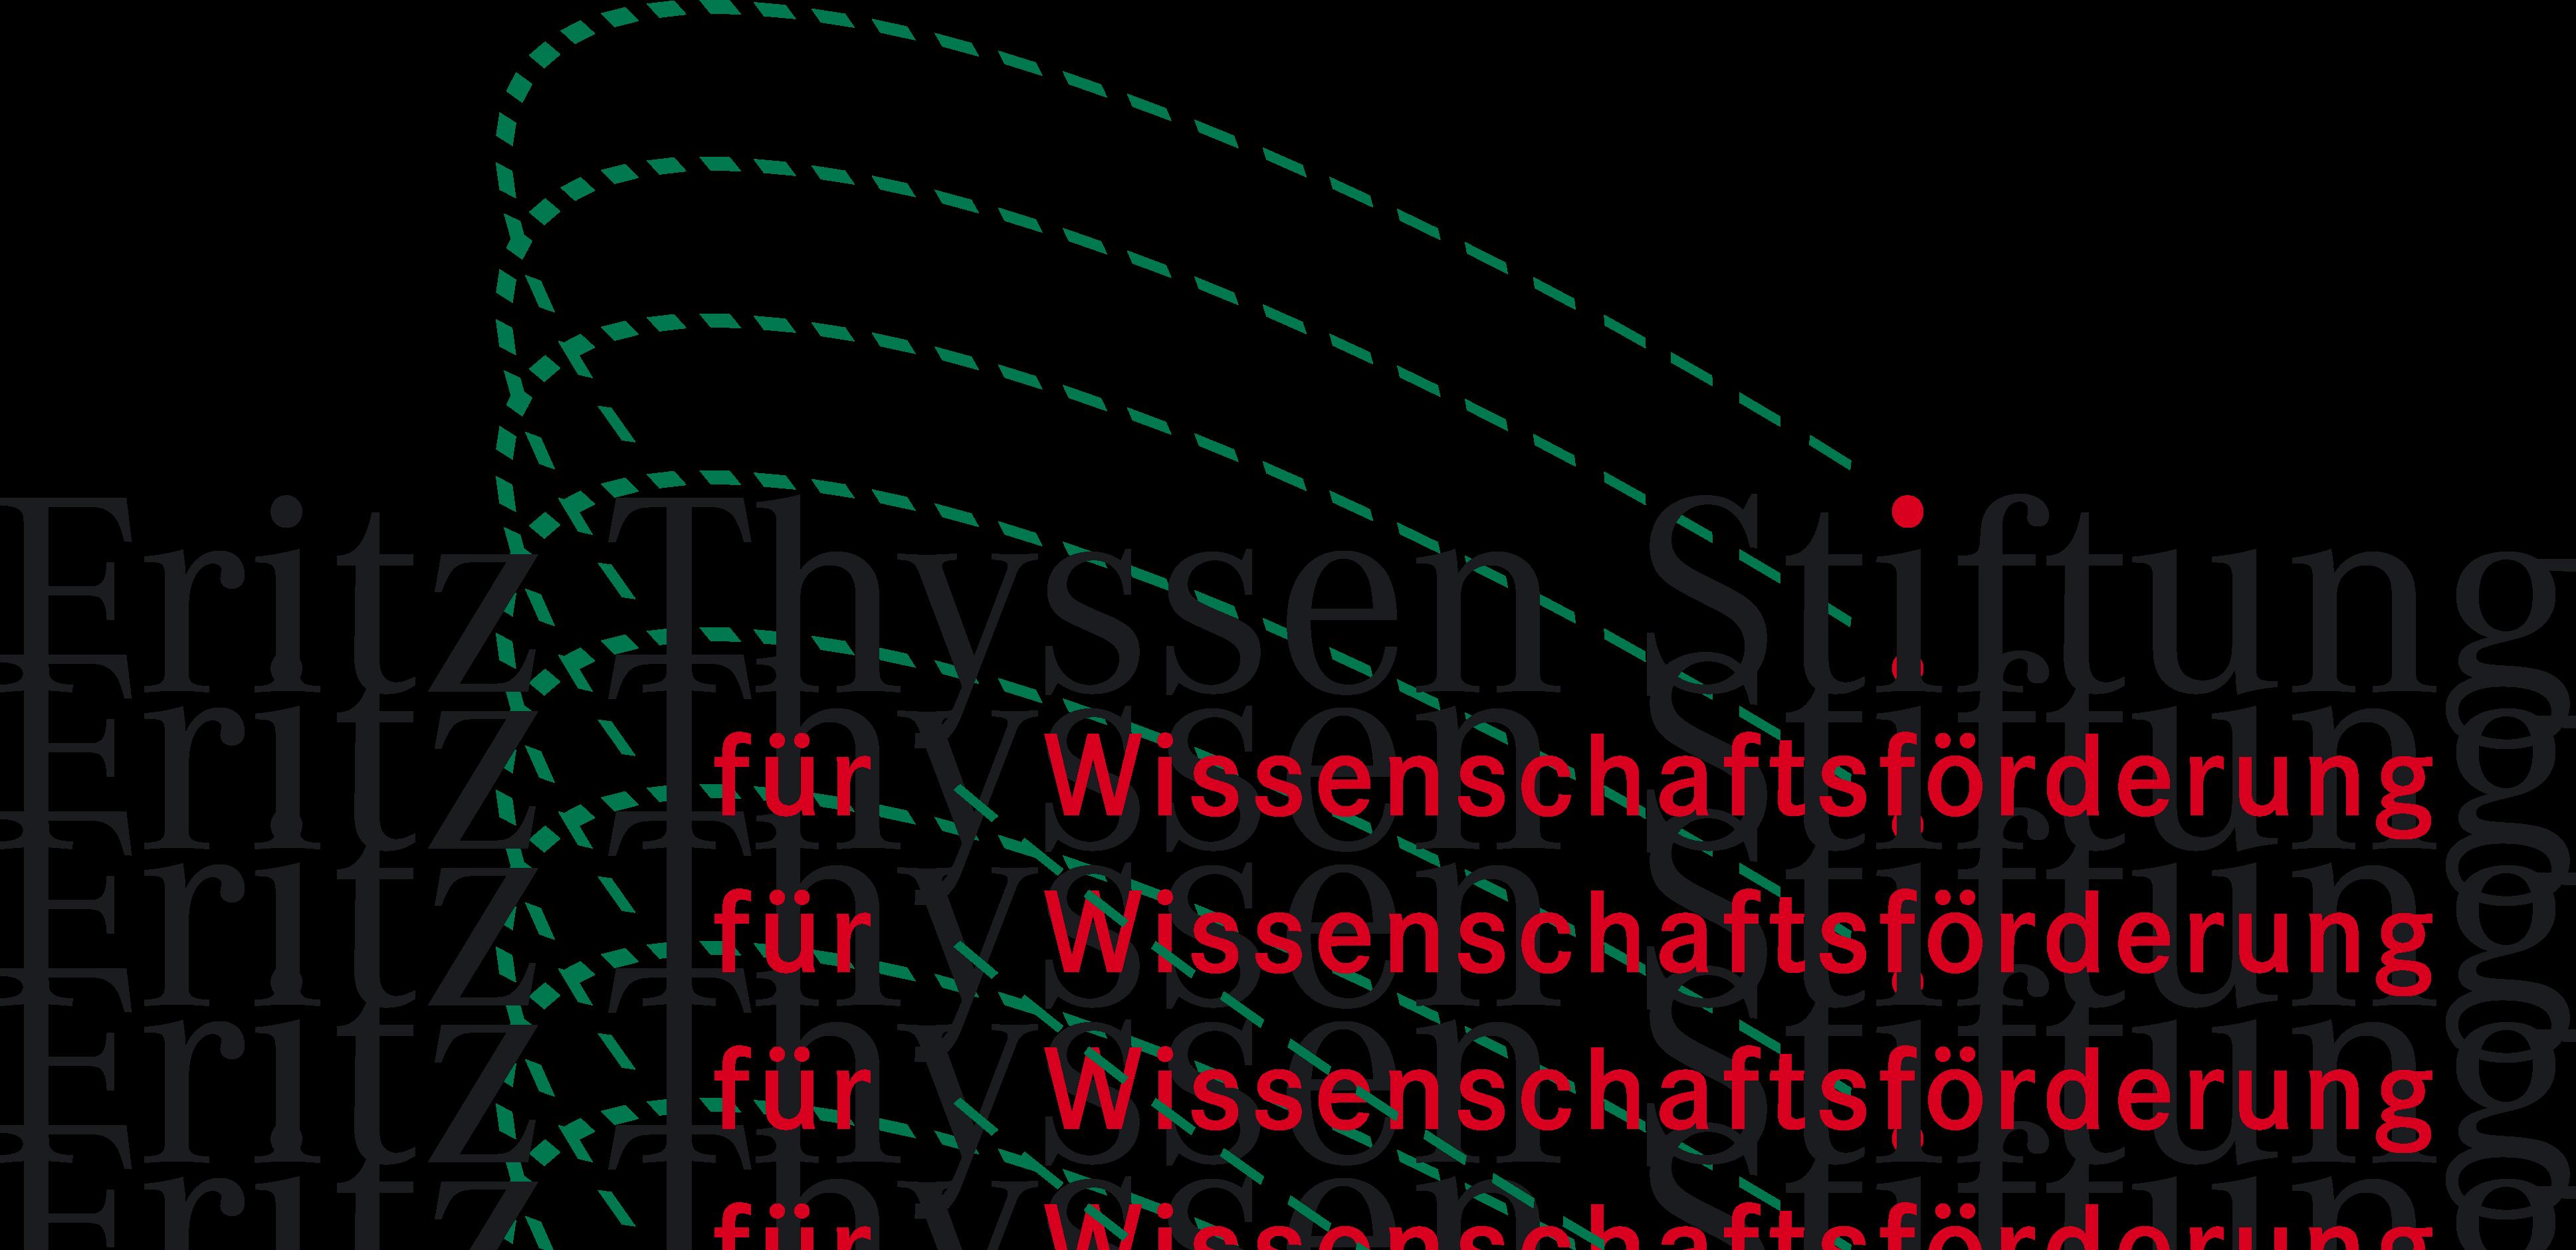 Картинки по запросу fritz thyssen foundation